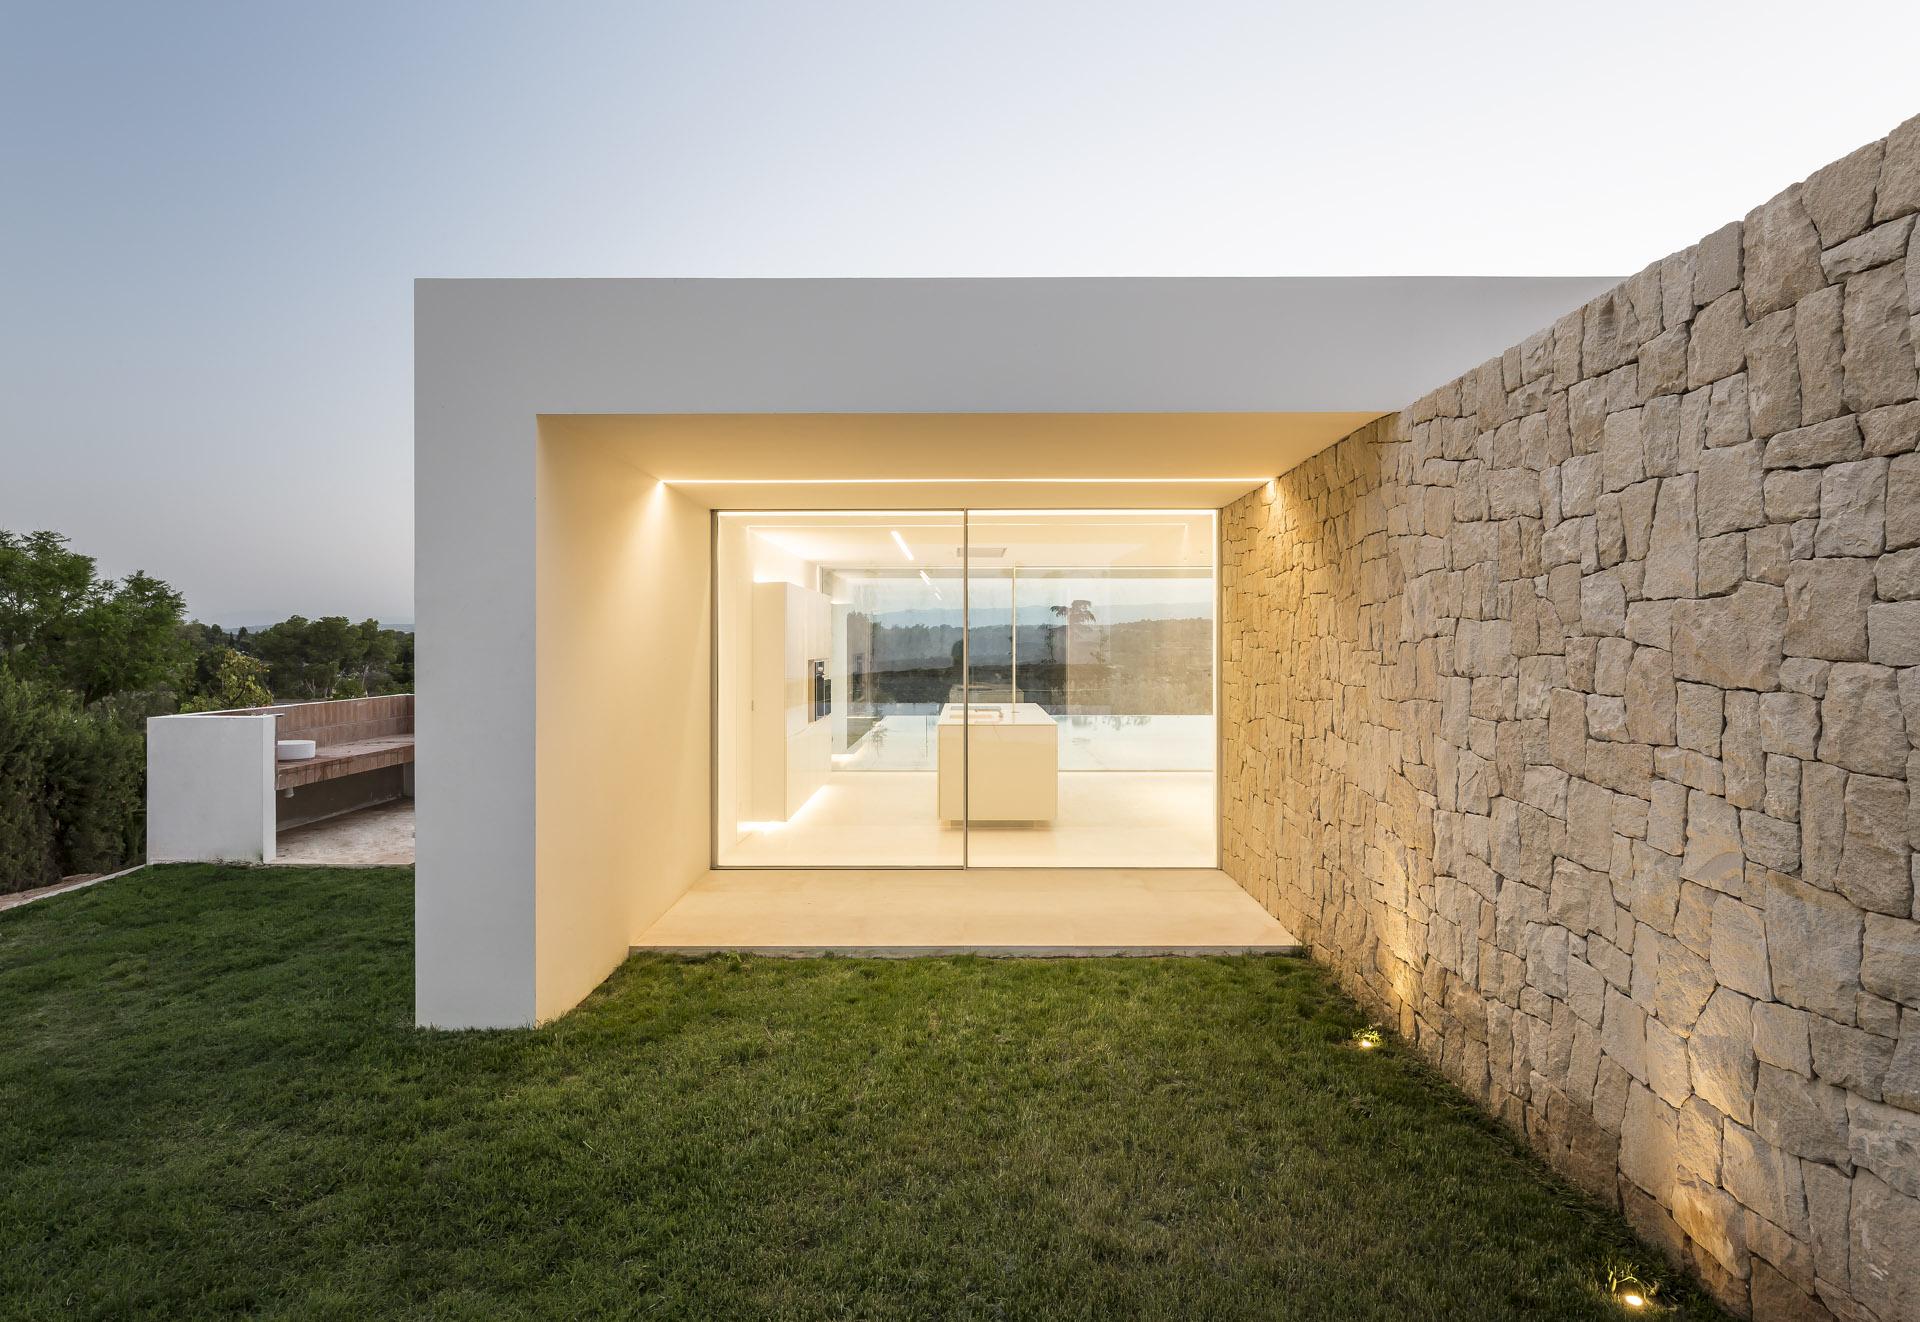 fotografia-arquitectura-valencia-german-cabo-gallardo-llopis-villamarchante-vivienda-56